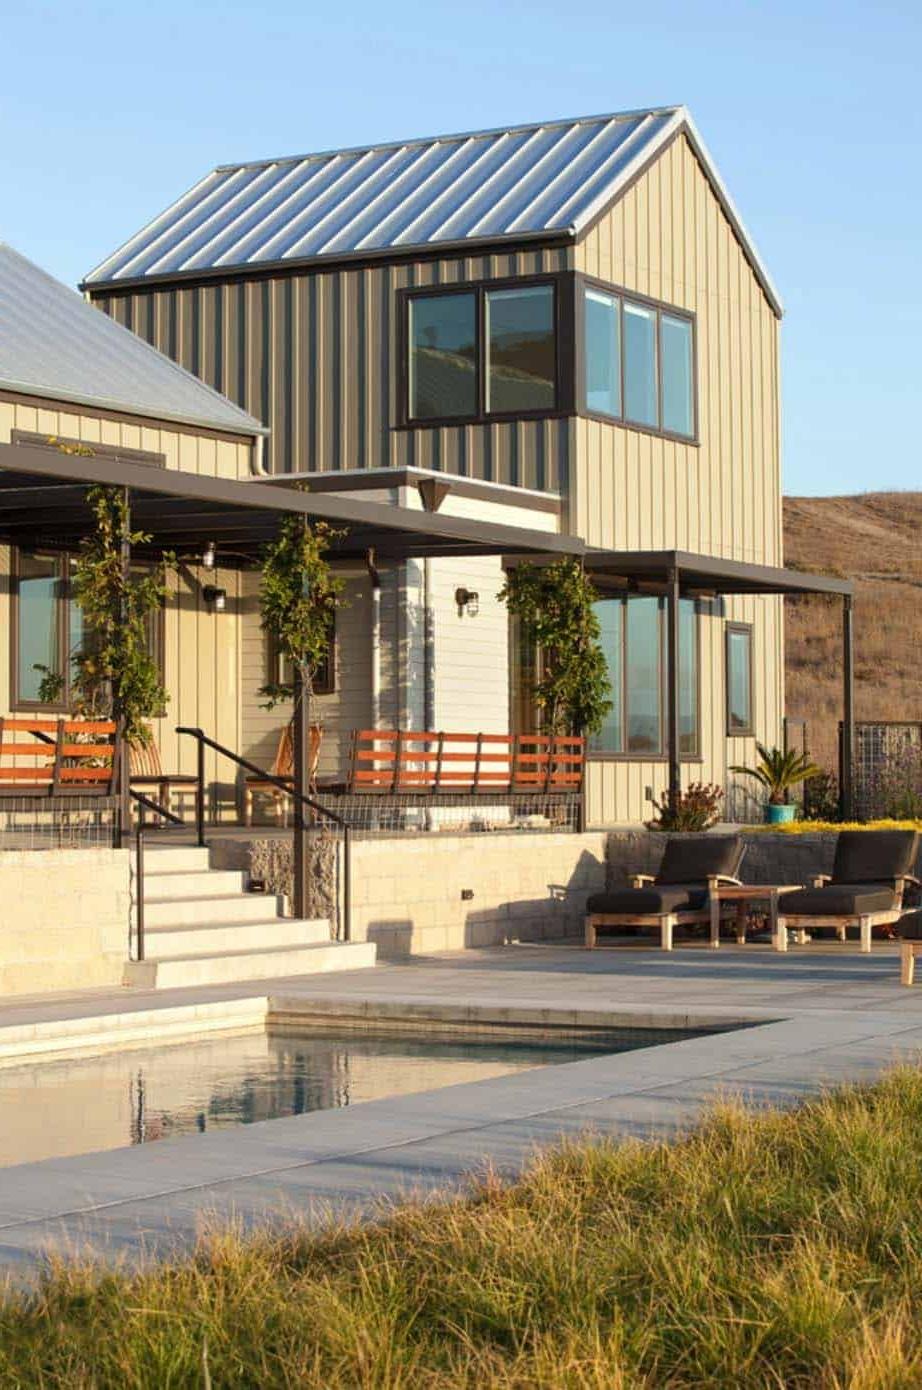 Sustainably Designed Modern Farmhouse Near The California